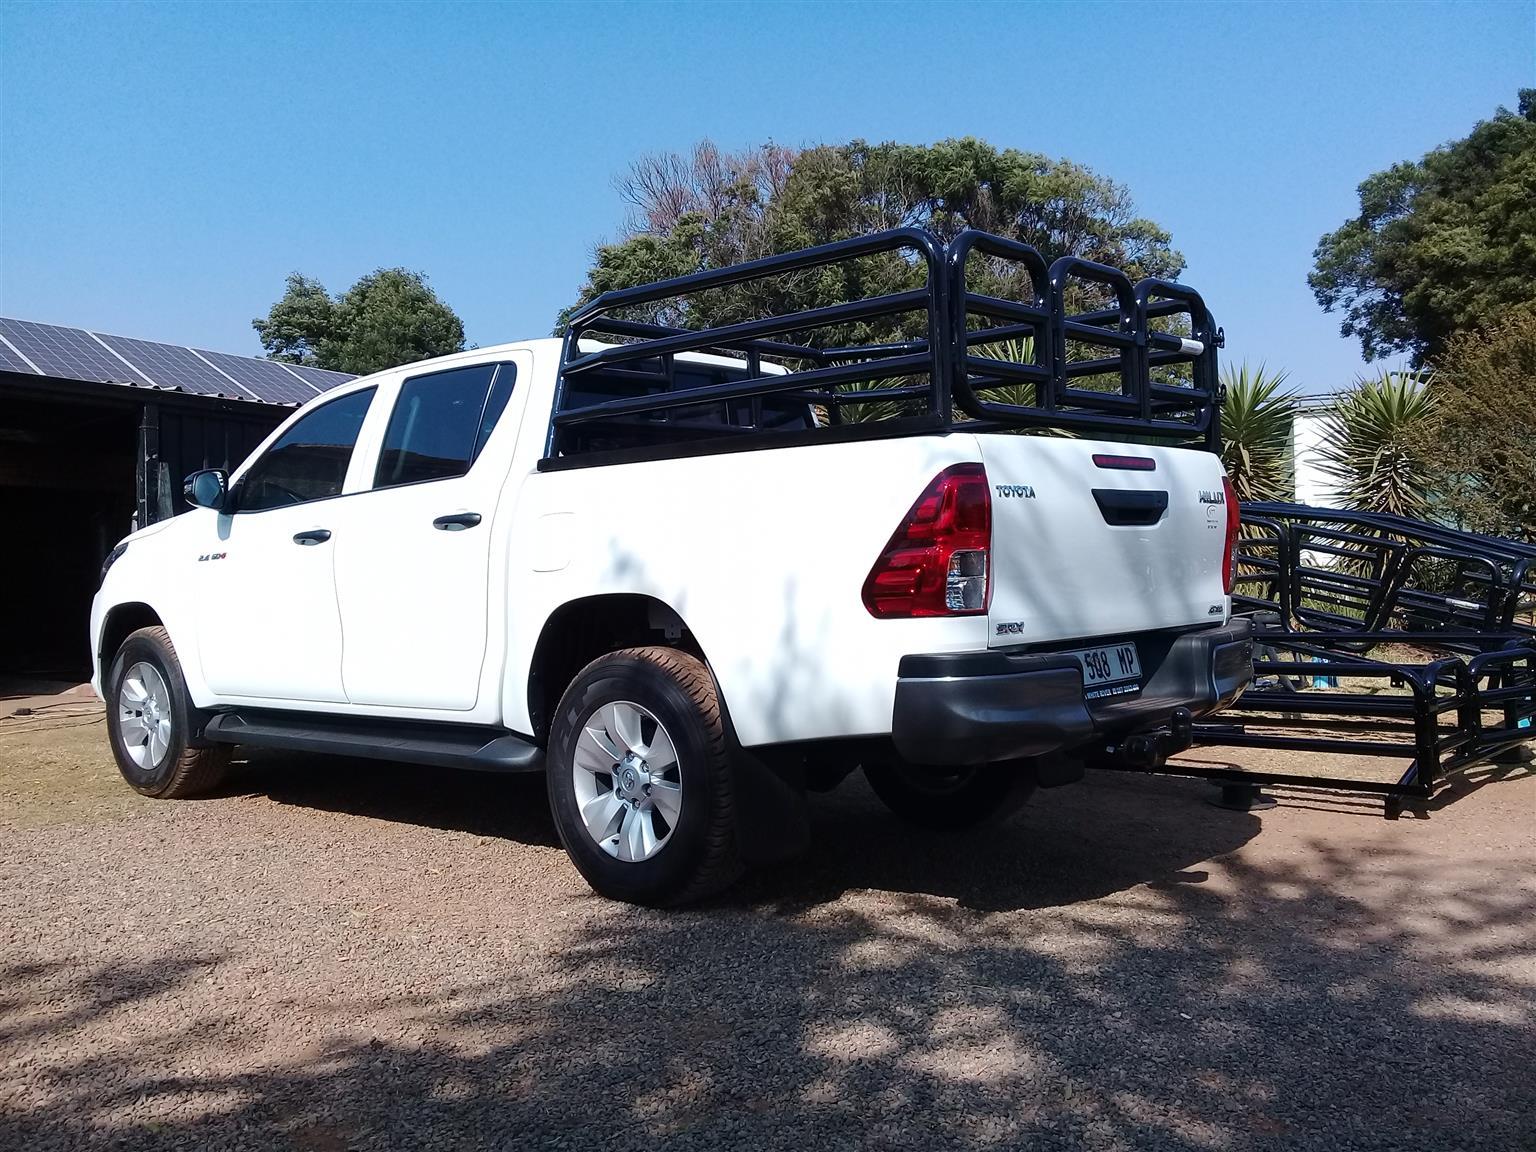 2021 farm vehicle cattle railings